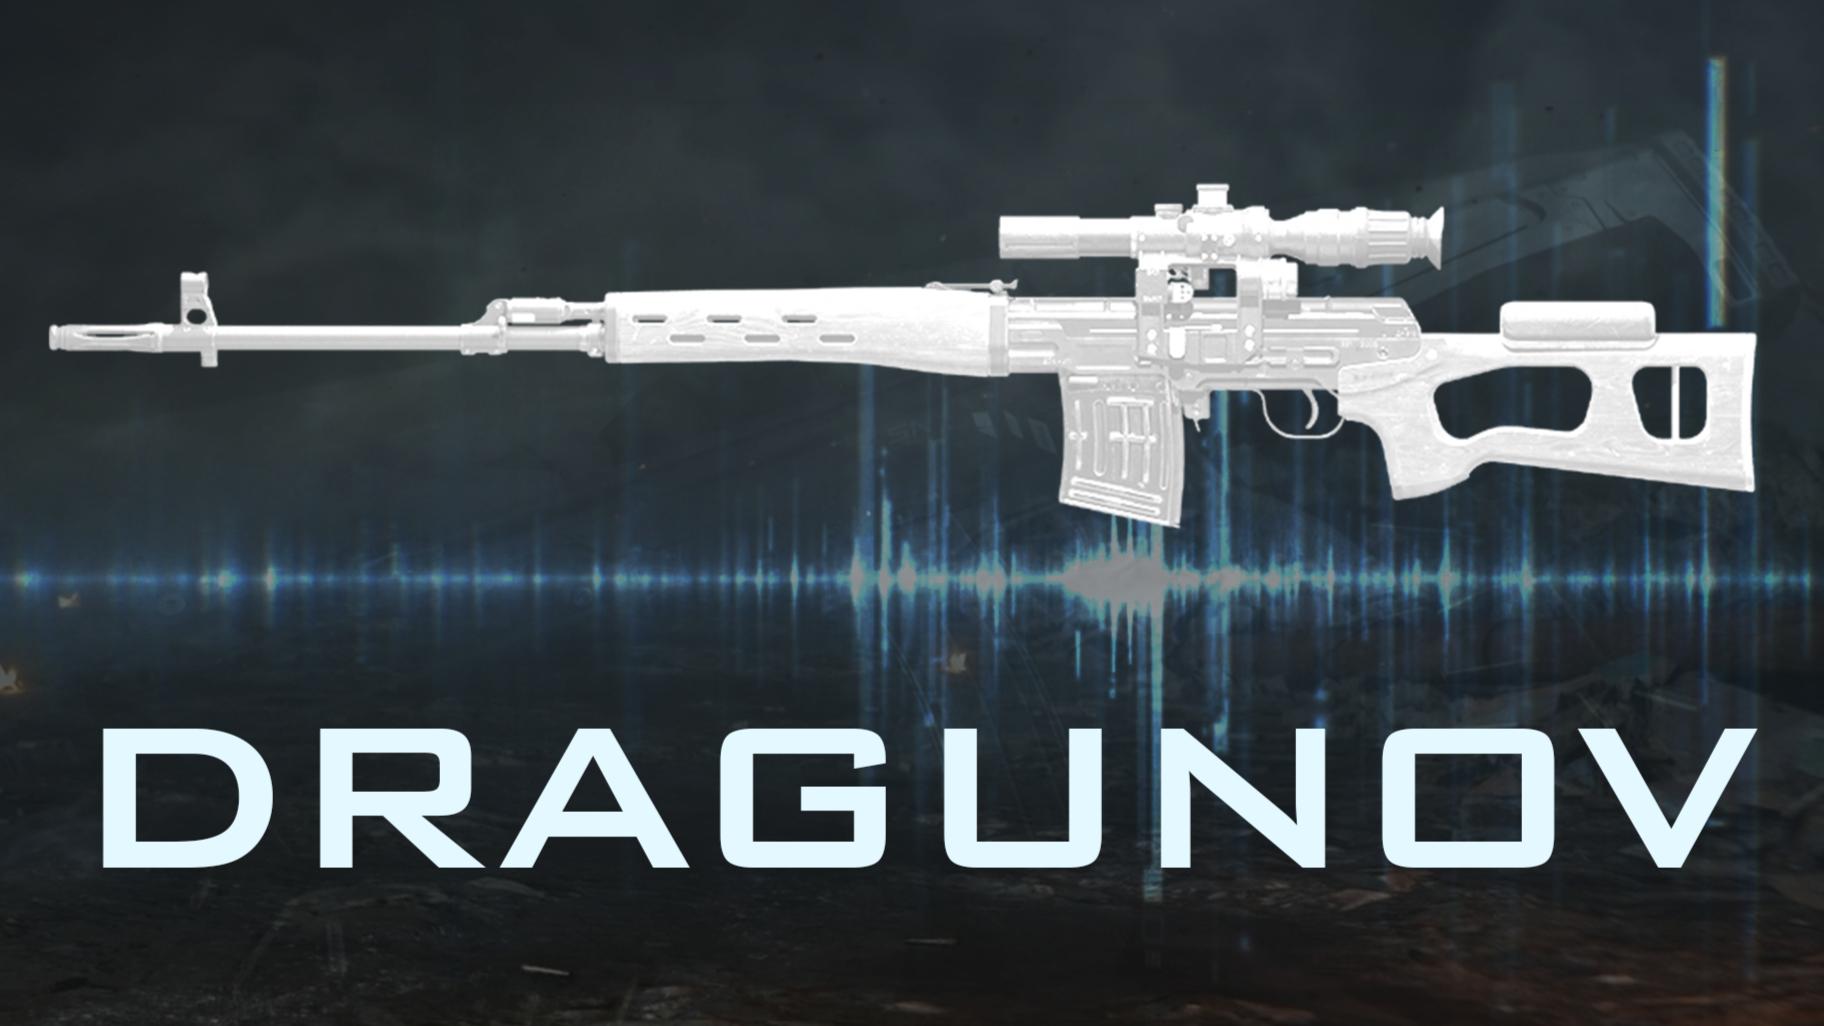 Dragunov 德拉古诺夫狙击步枪『现代战争武器指南』VOL.13